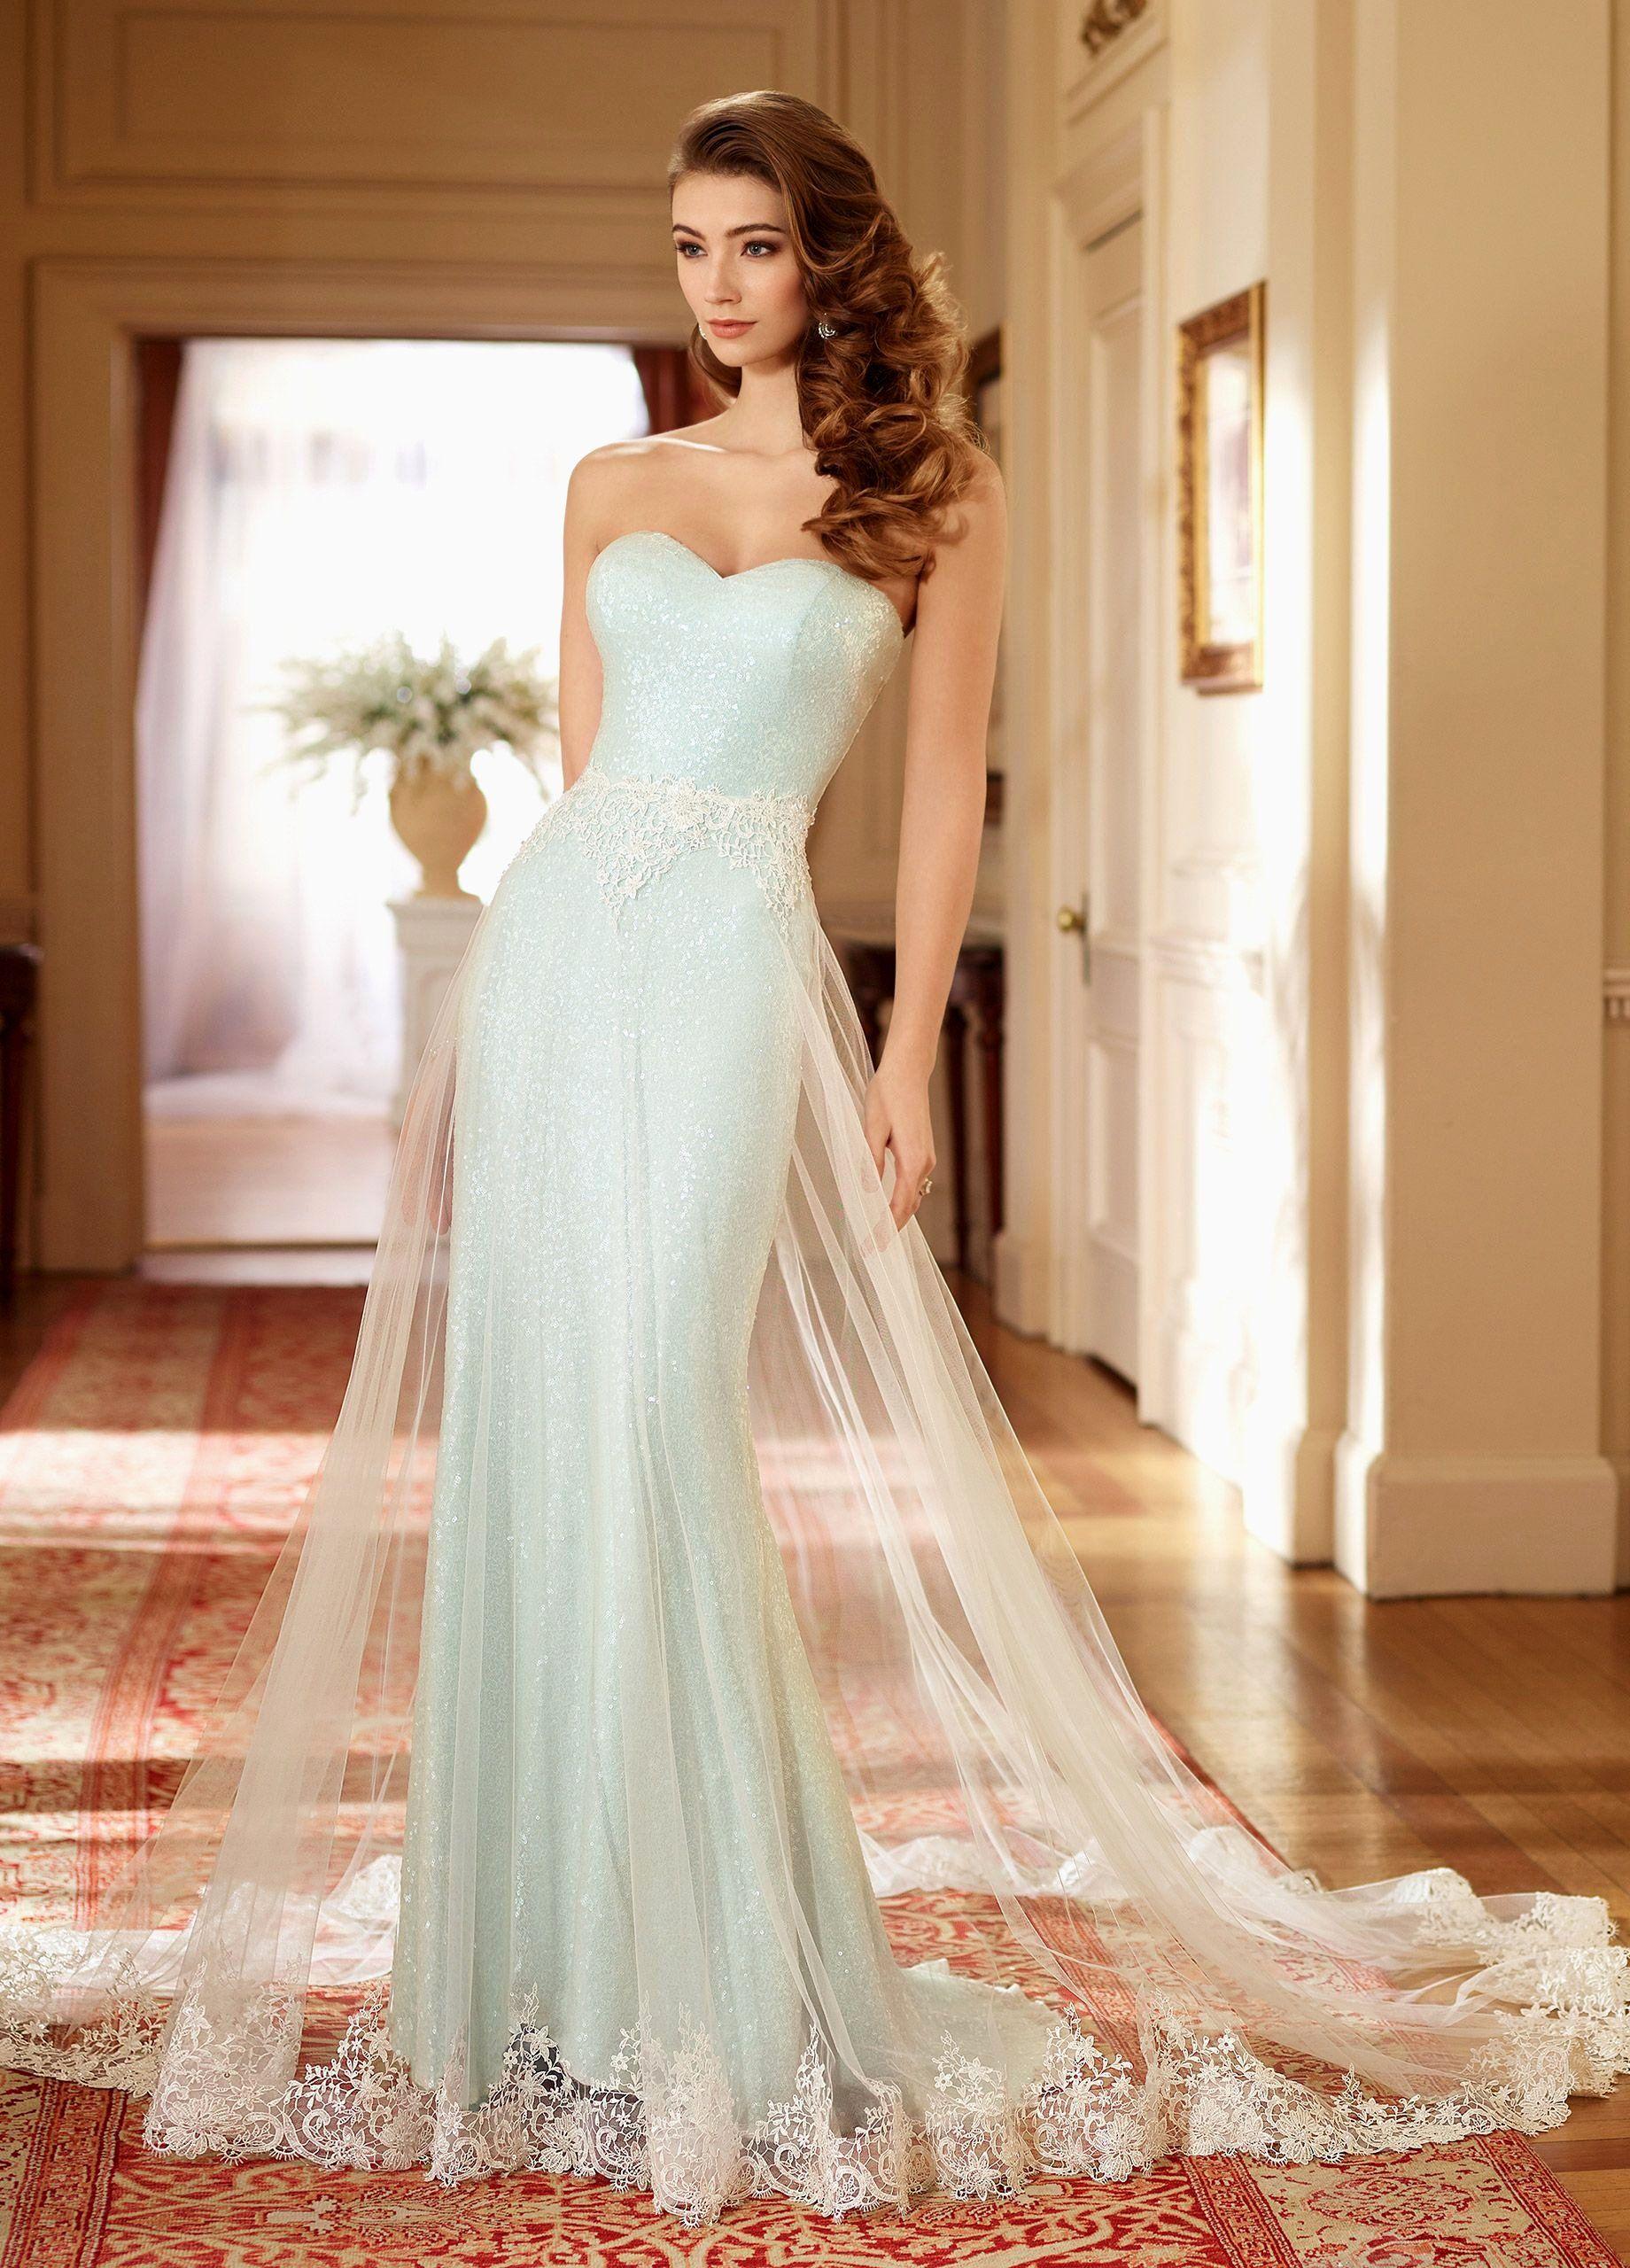 25 Wedding Dress with Detachable Skirt Wedding dresses